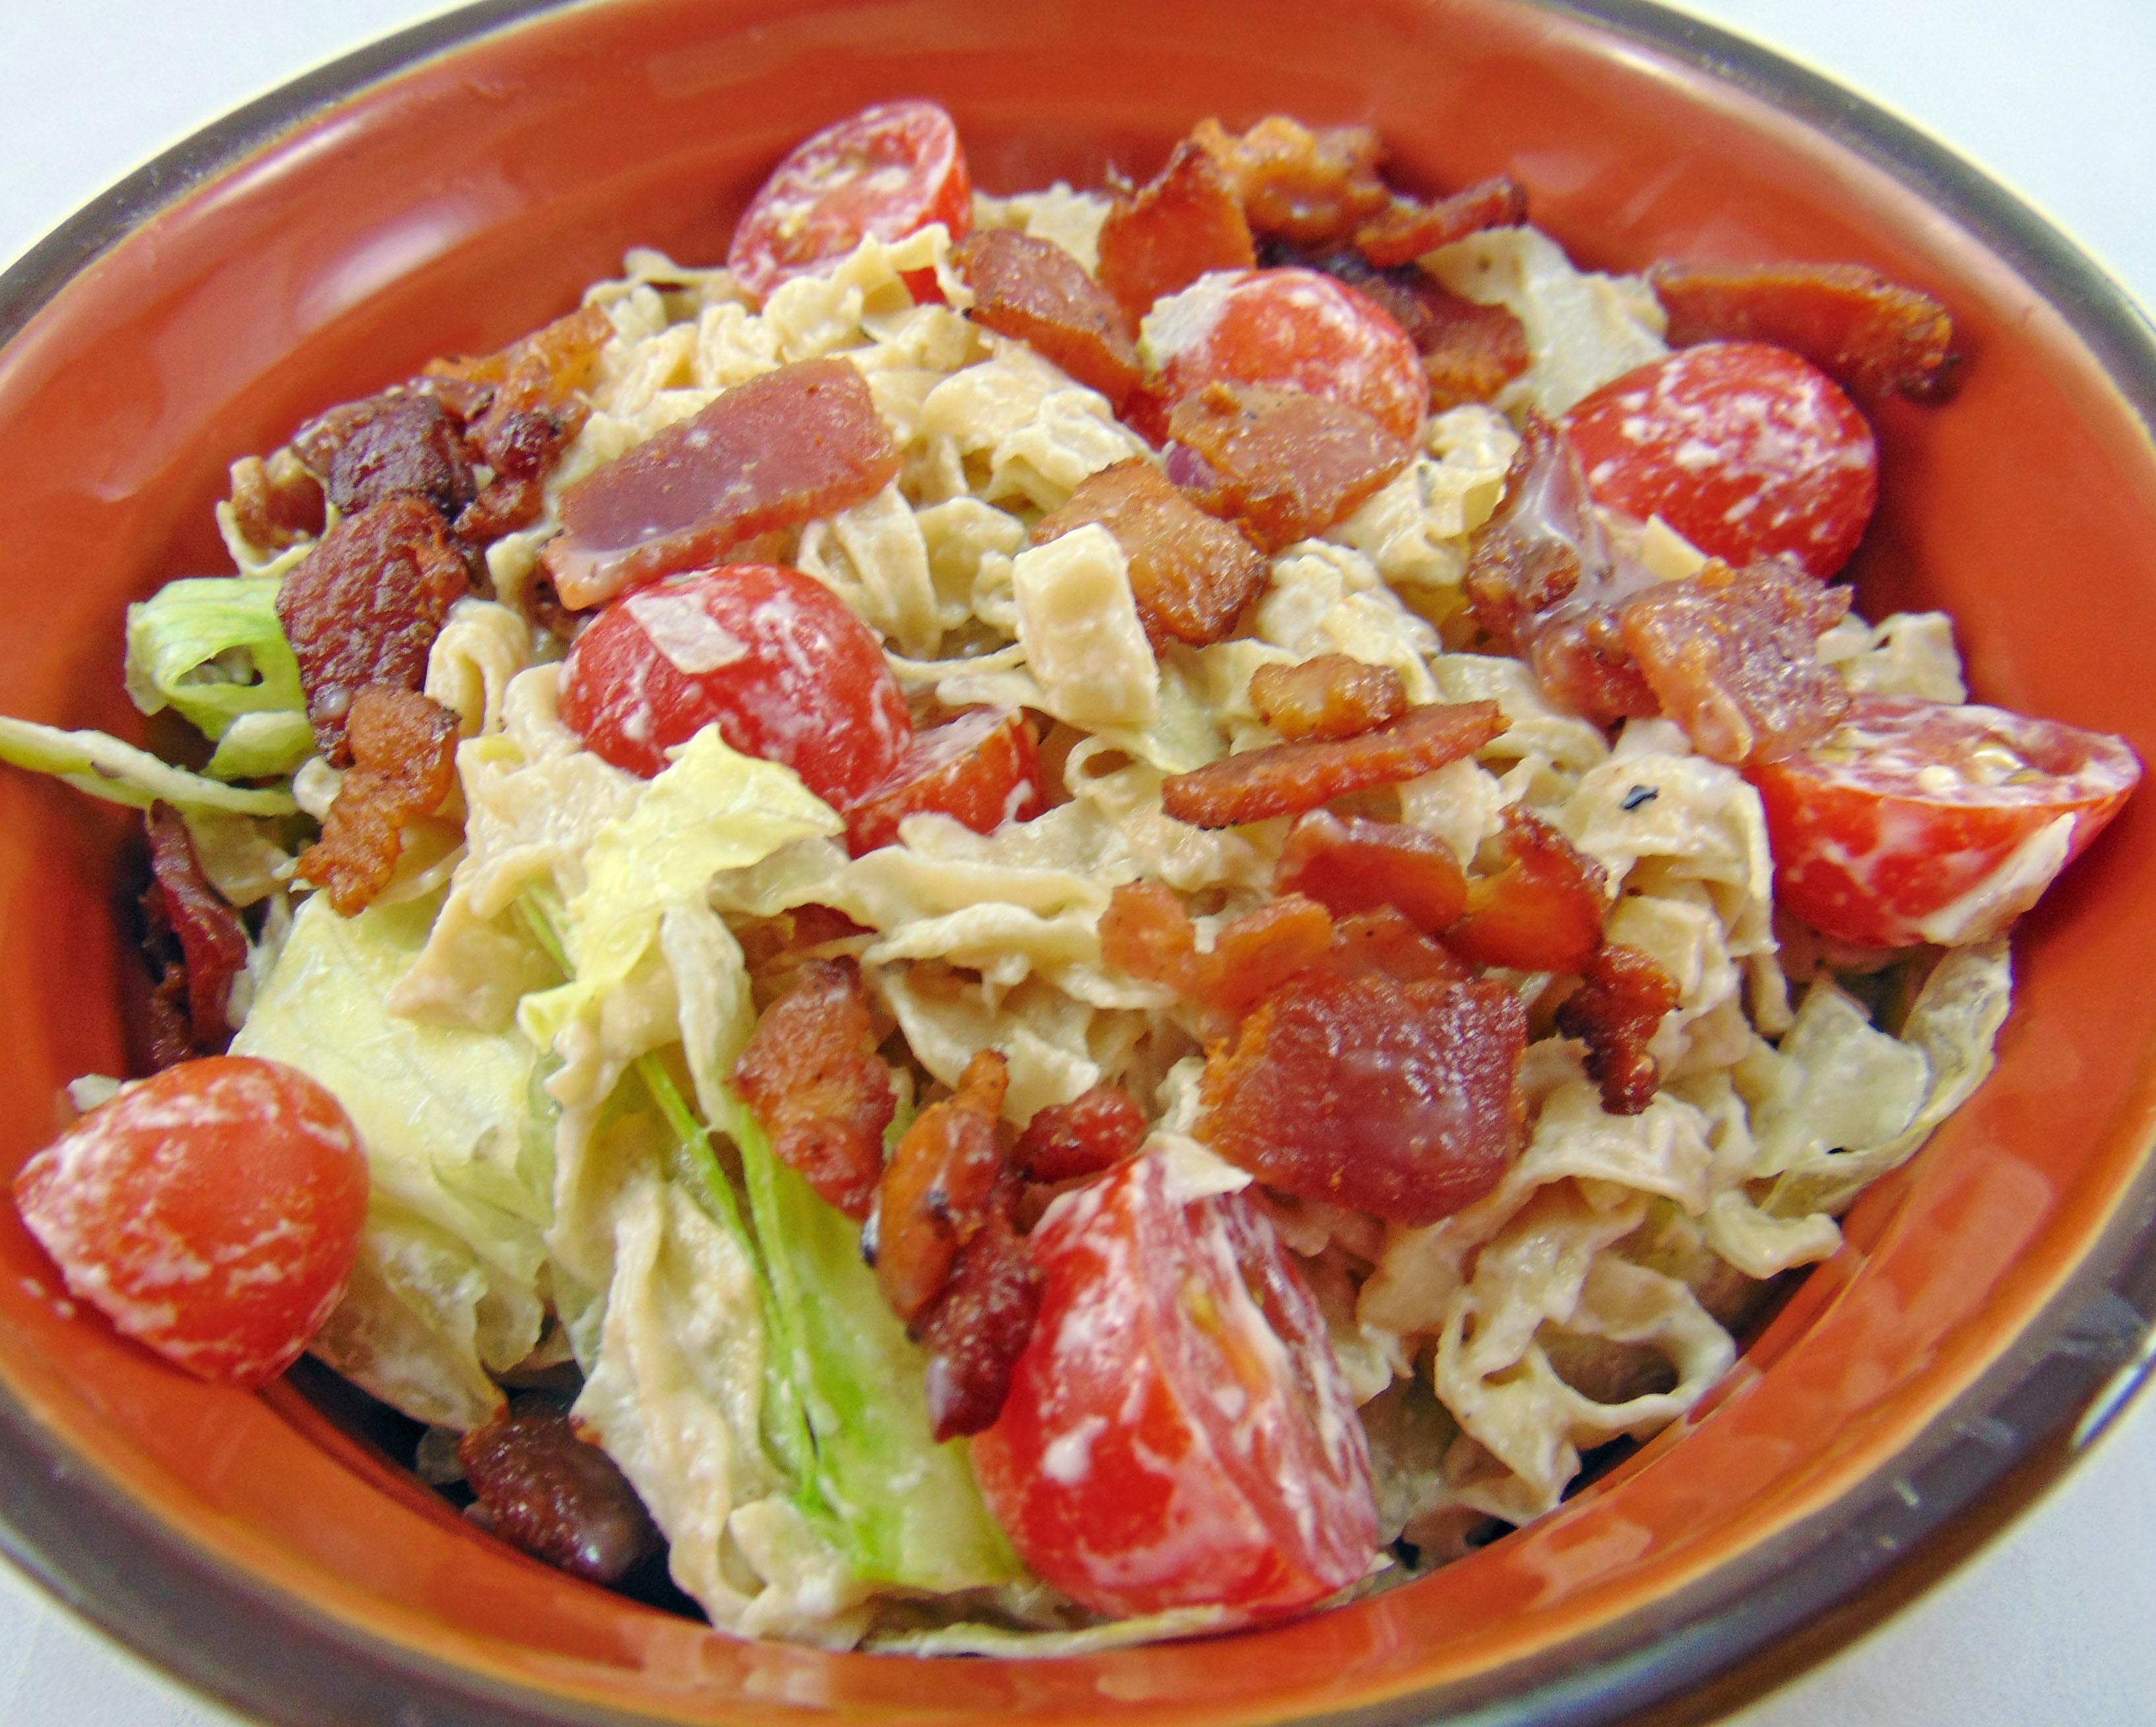 Thumbnail for Low Carb BLT Pasta Salad